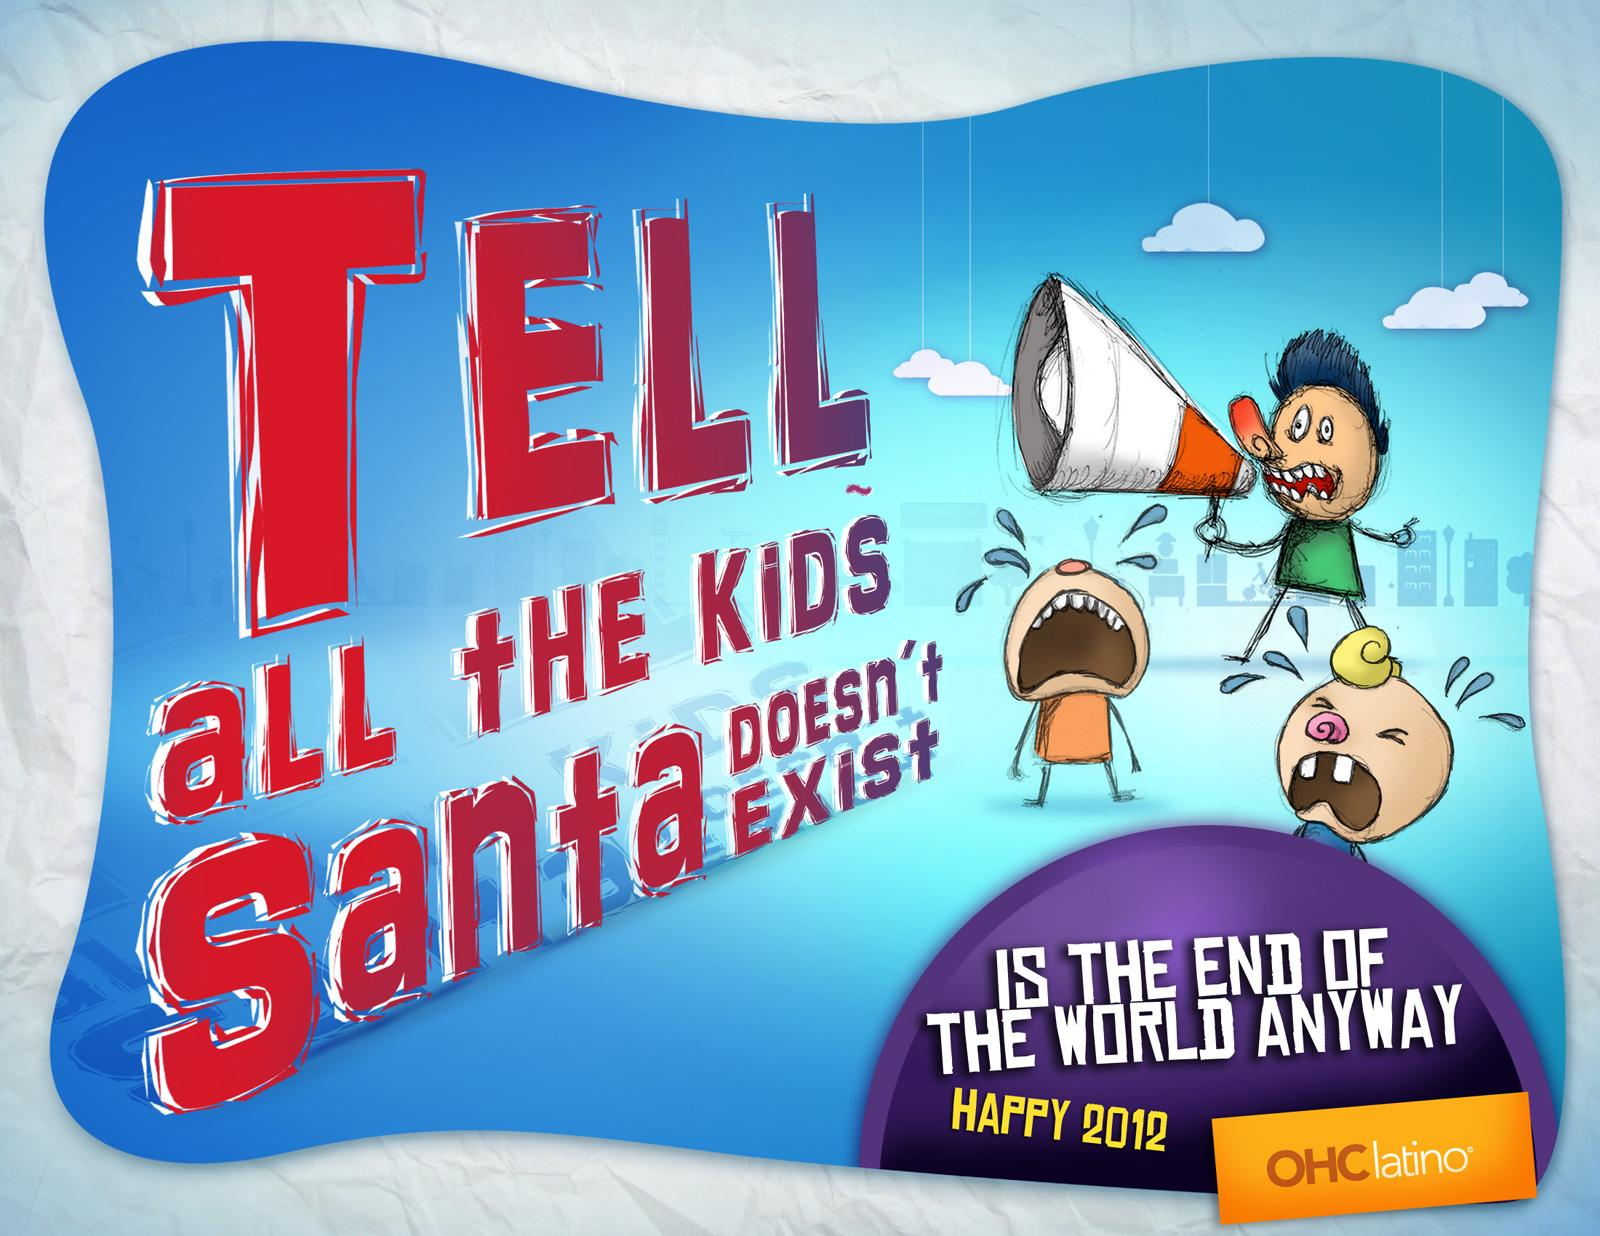 OHC latino Print Ad -  Santa